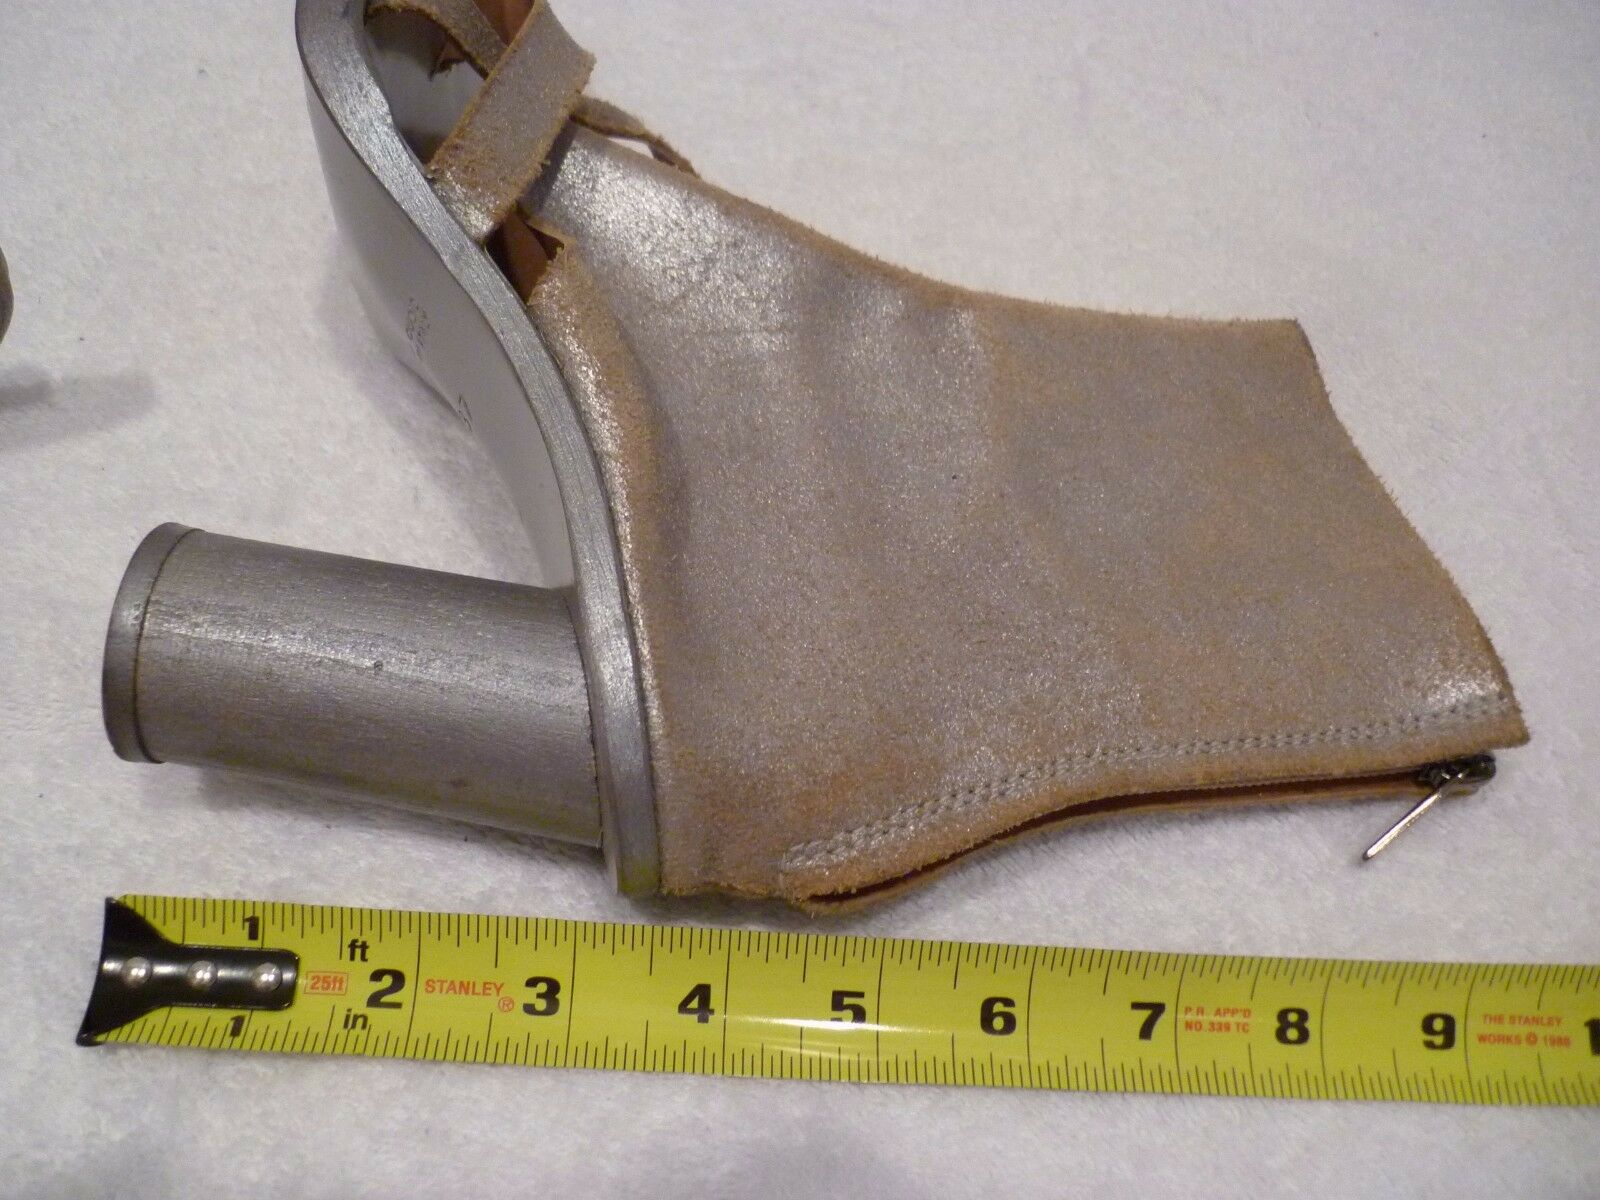 Peachoo + Krejberg leather open toe ankle boot boot boot heels metallic fabric SZ 37 7 6.5 cb3672